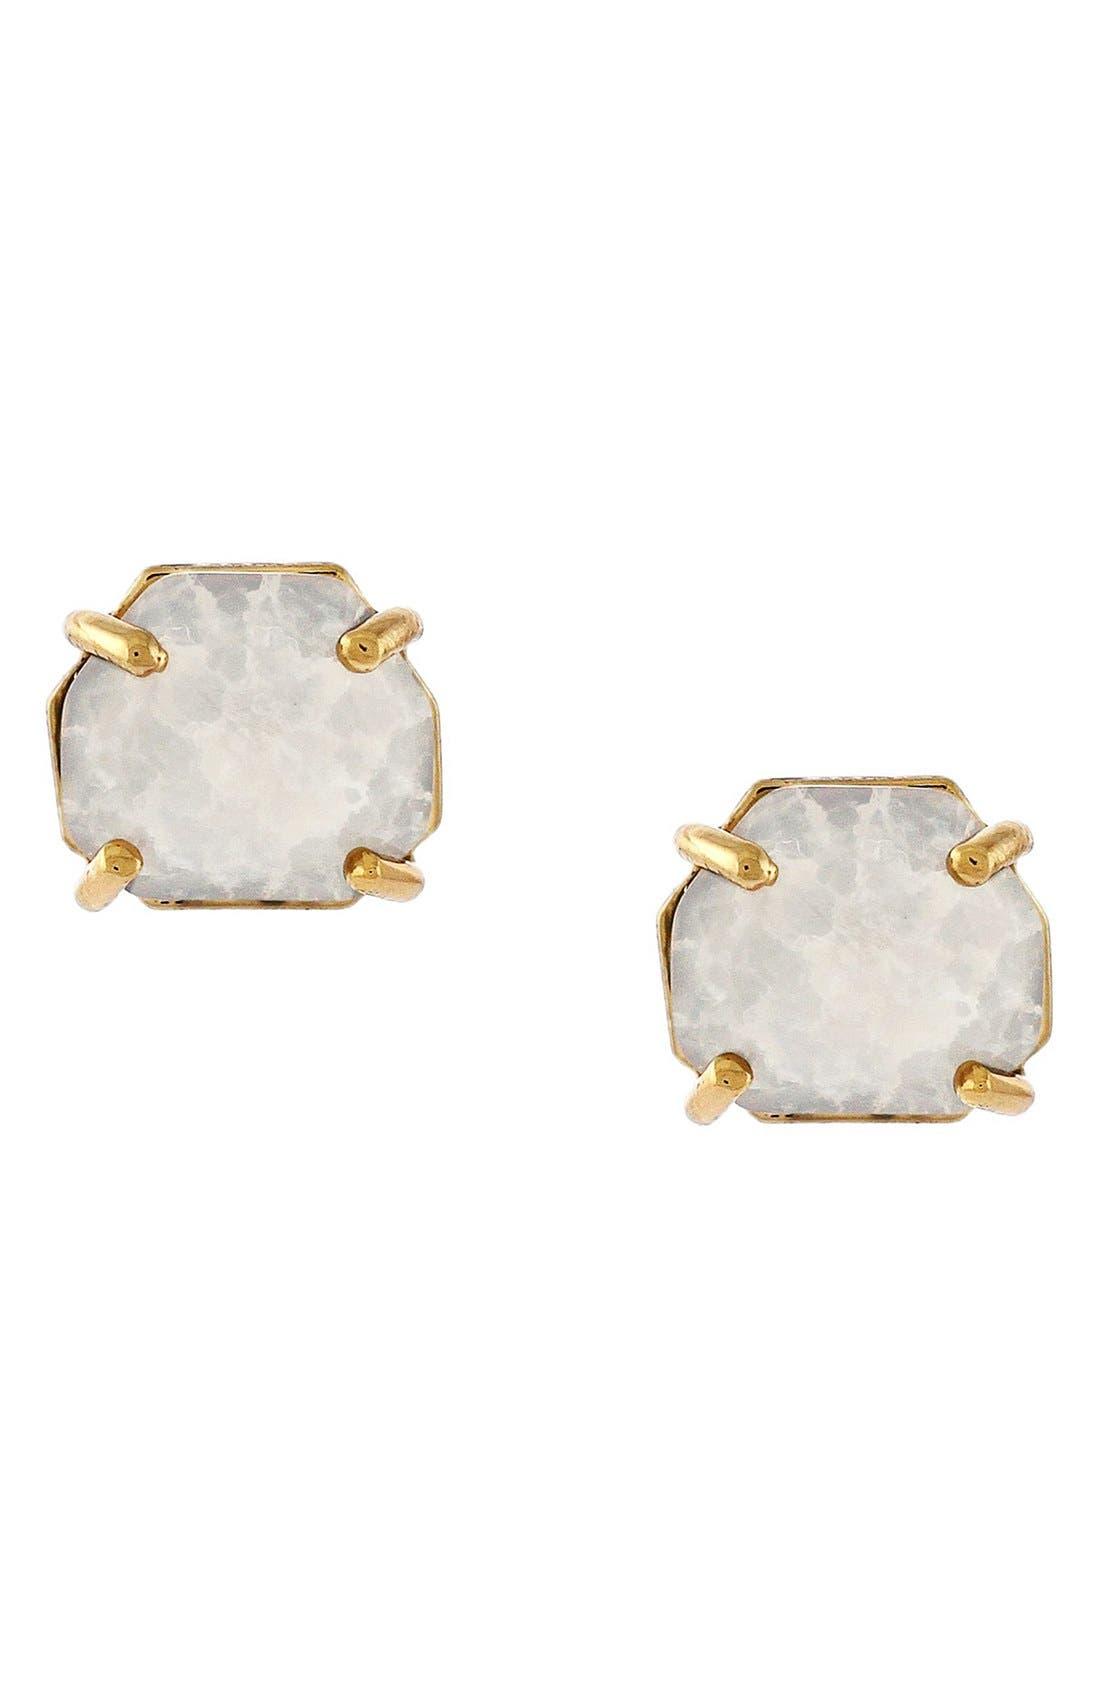 Crystal Stud Earrings,                             Main thumbnail 1, color,                             650